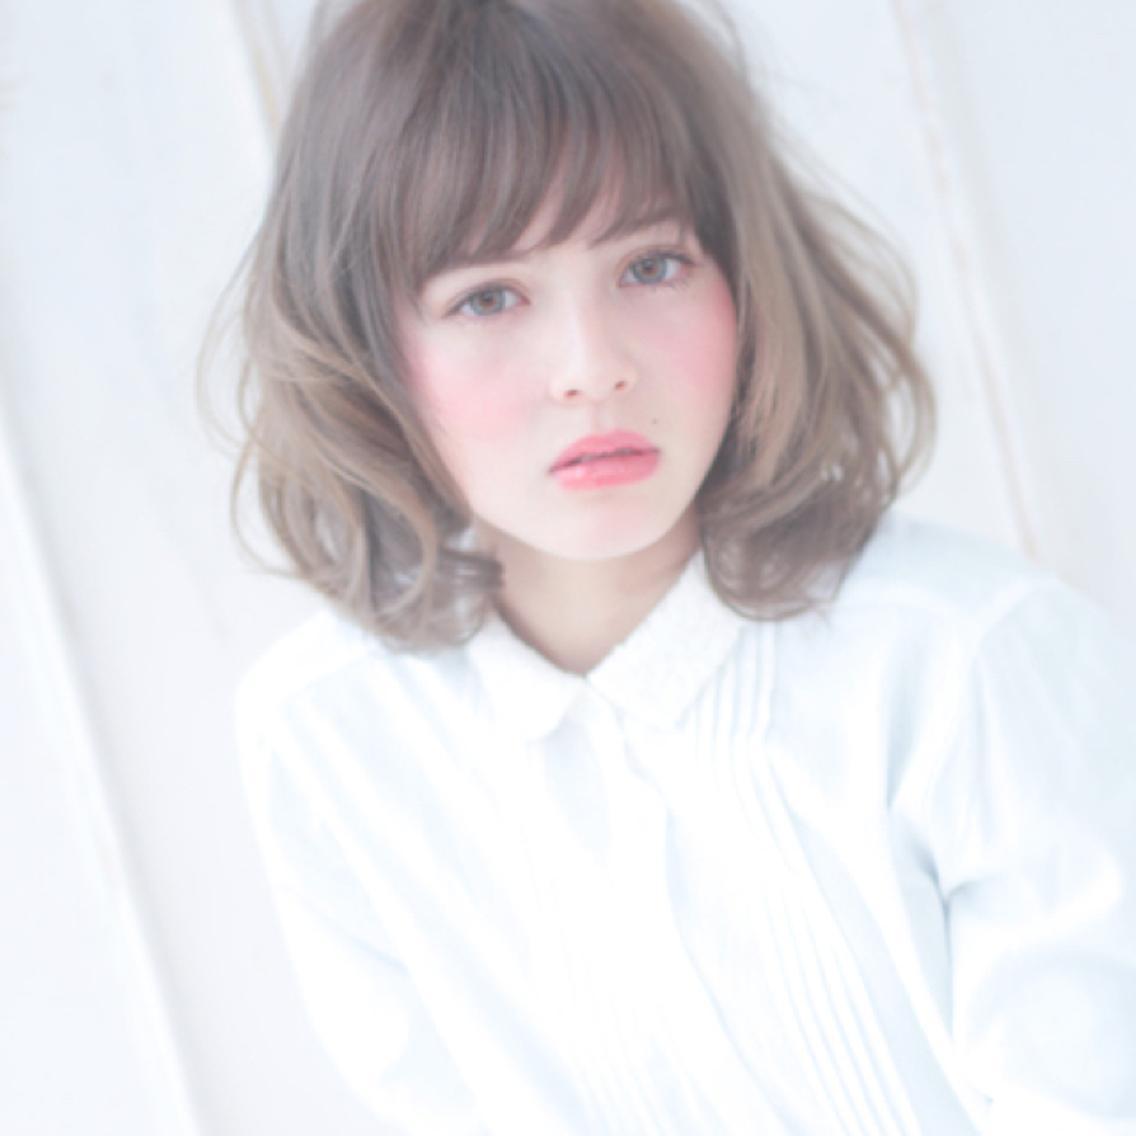 ⭐️カット&カラー4500円ナノスチーム付透明感、フェミニン、ガーリー。可愛いを引き出します✨イルミナカラー✨オージュアTR✨グランドオープン記念お得メニュー多数掲